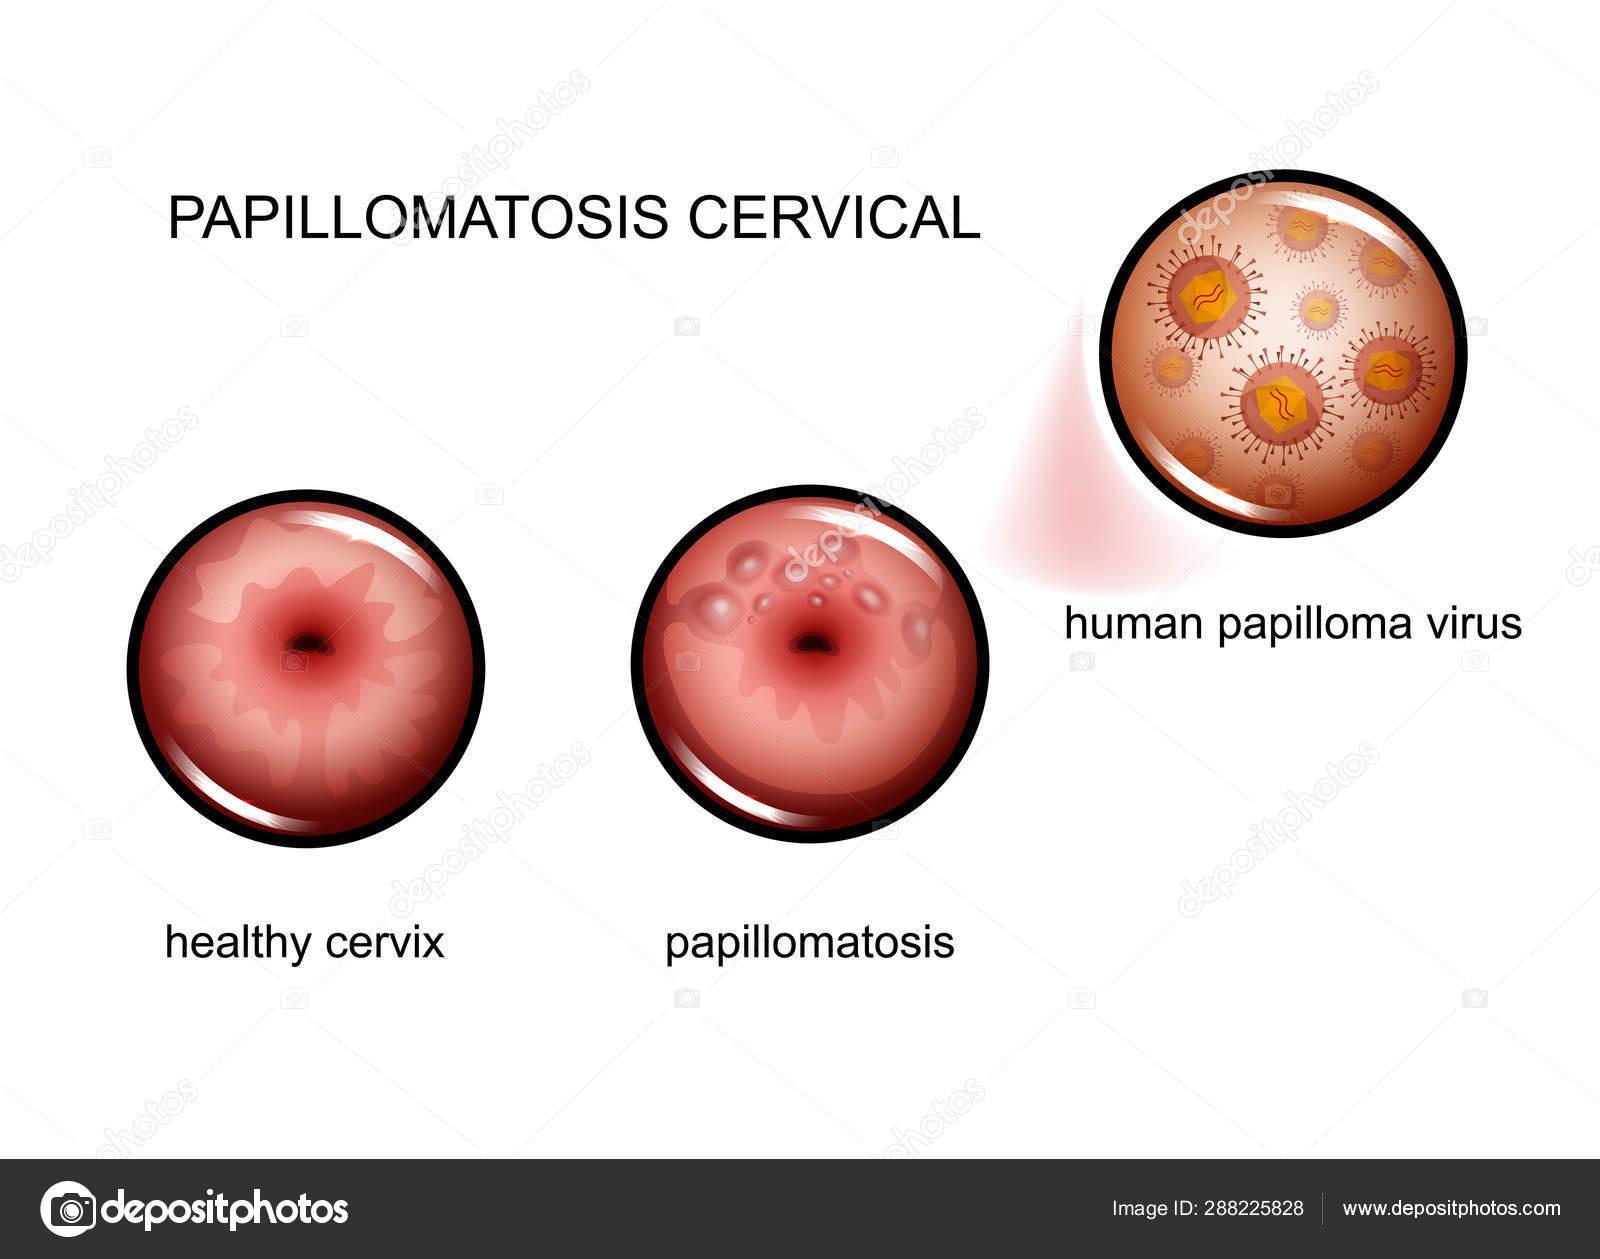 humán papillomavírus po polsku